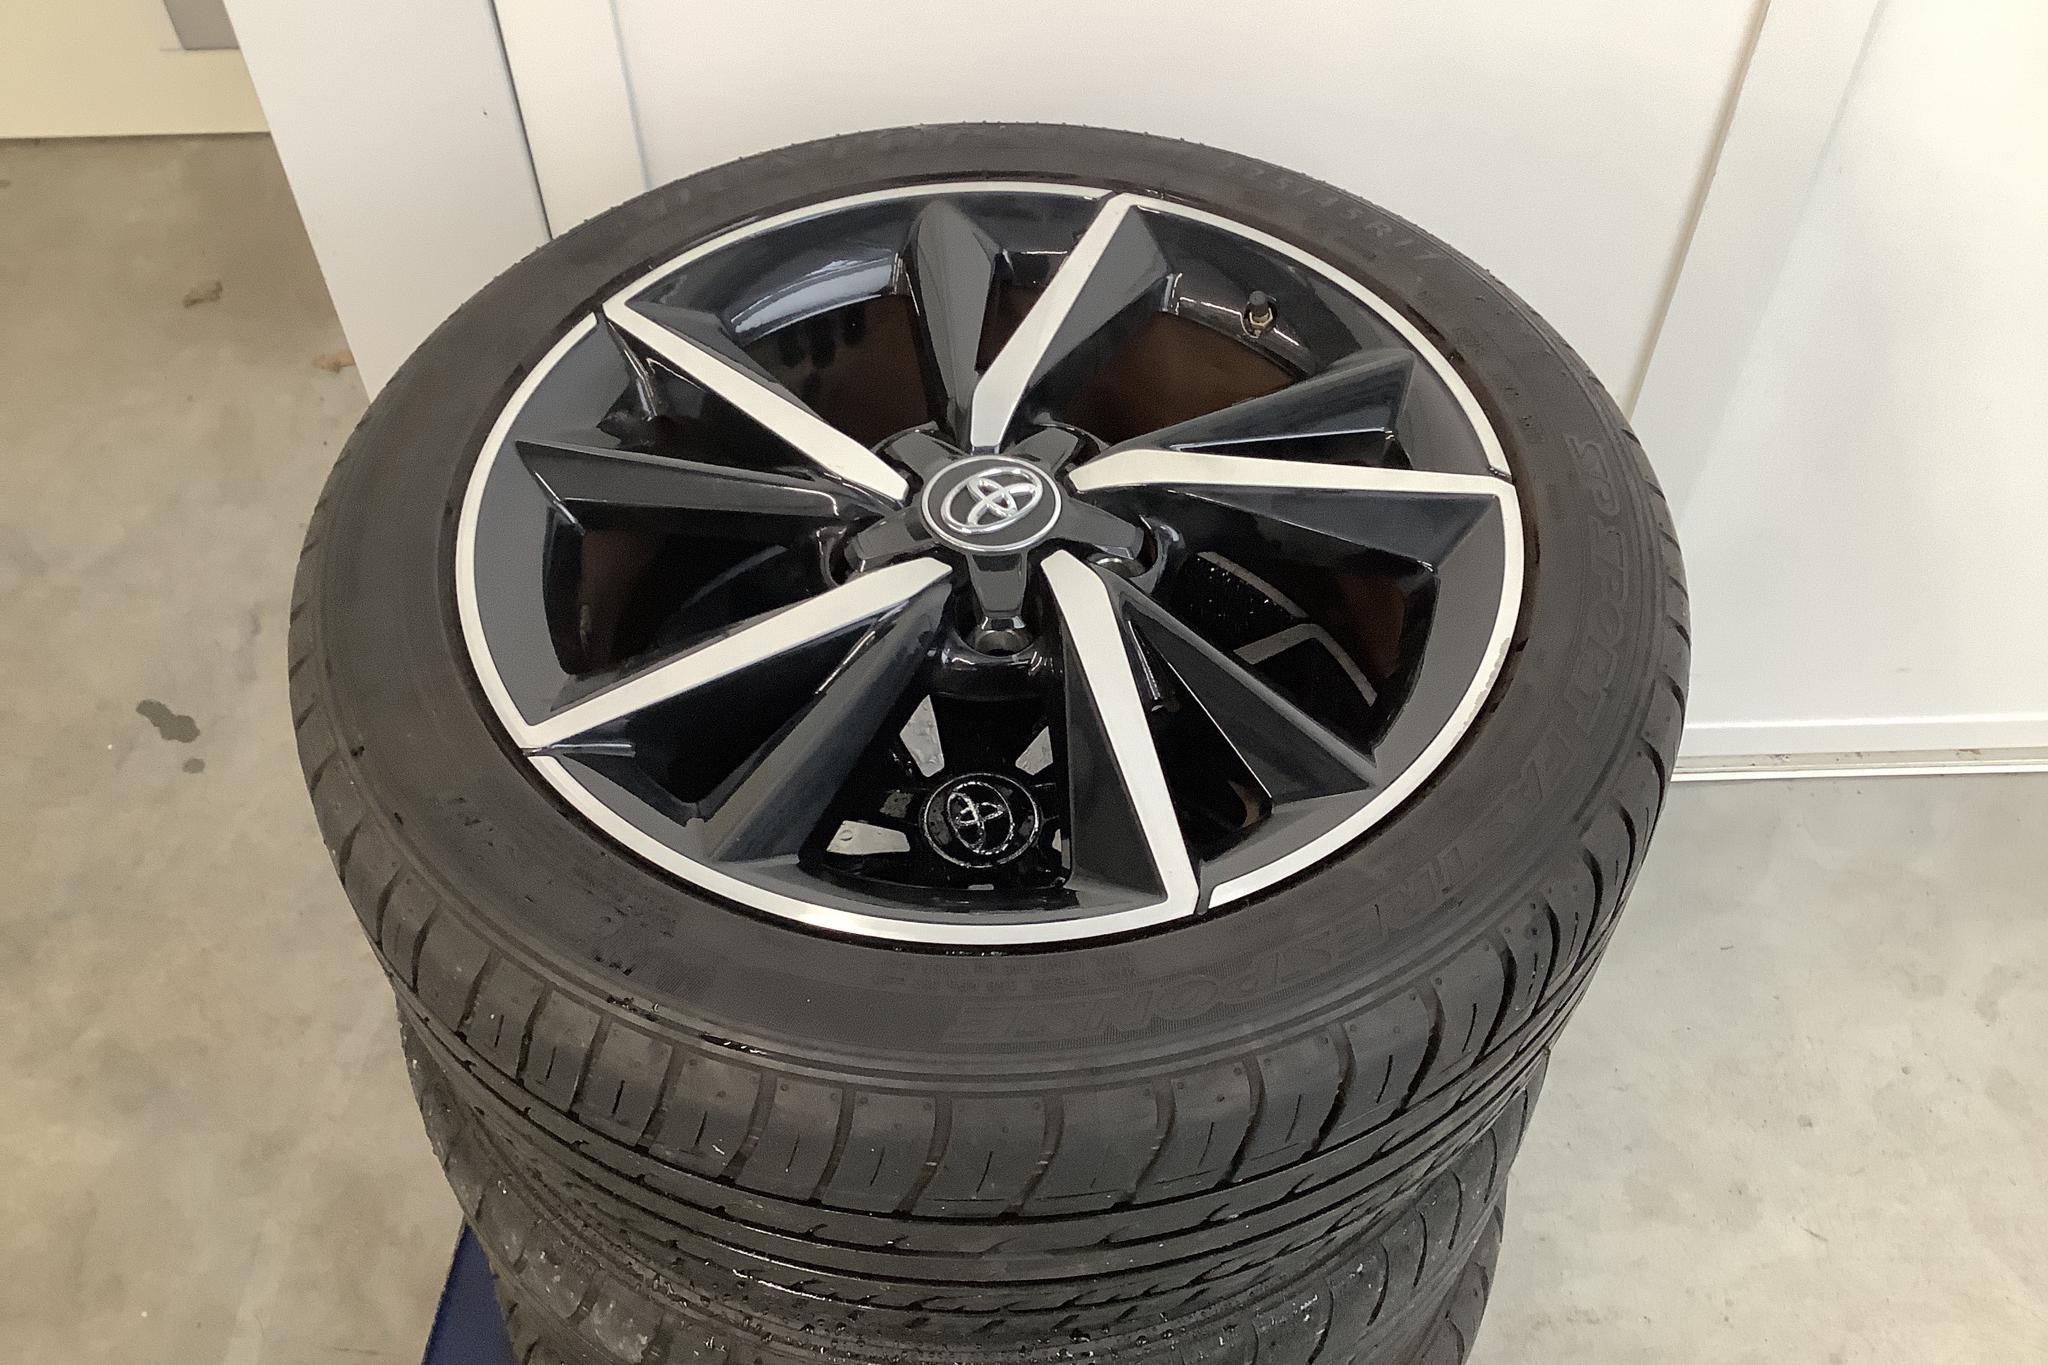 Toyota Auris 1.8 HSD Touring Sports (99hk) - 45 570 km - Automatic - white - 2017